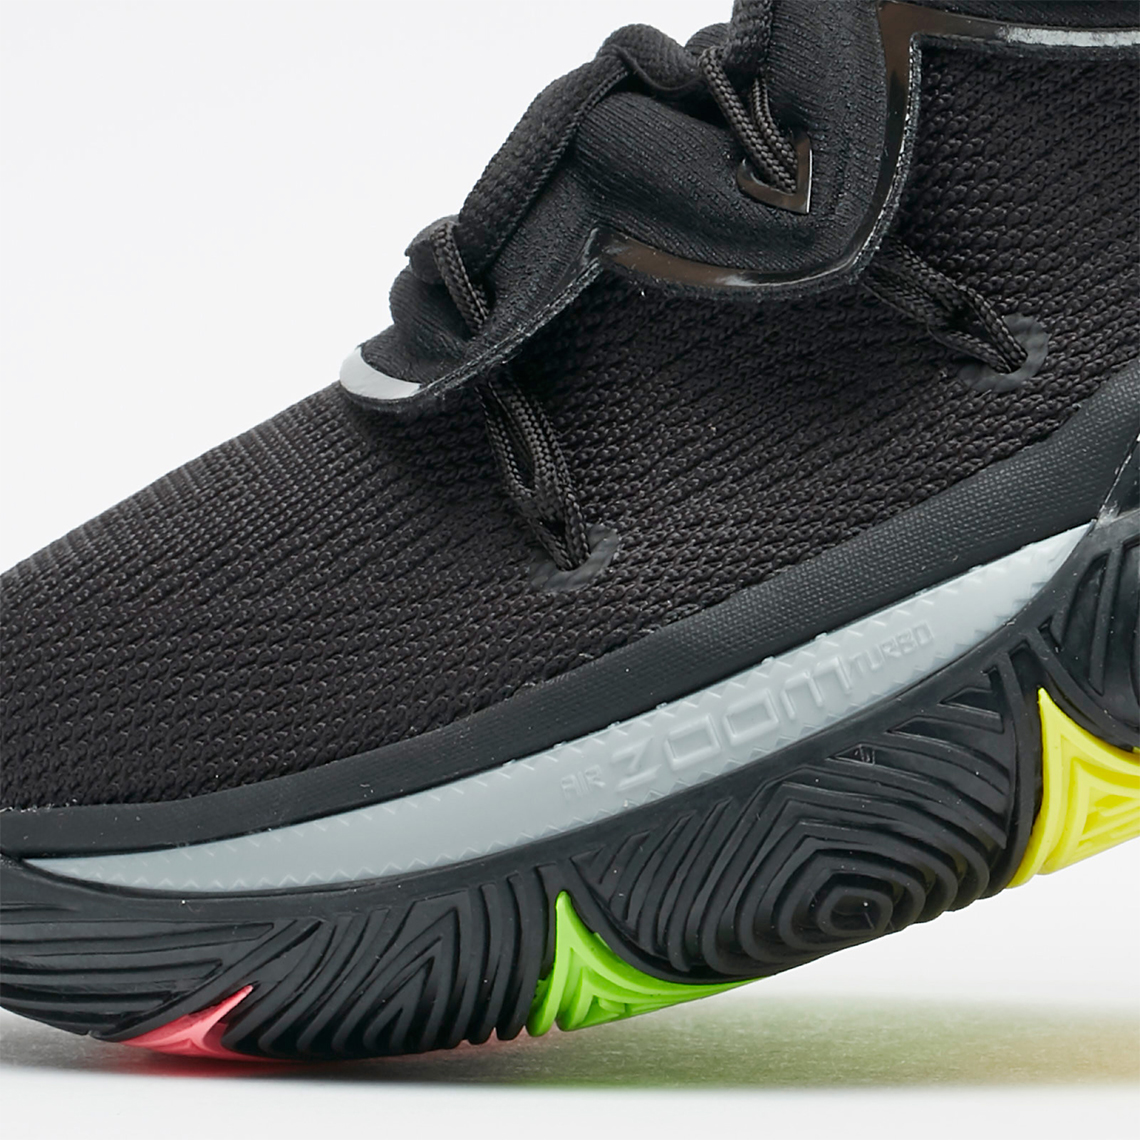 Nike Kyrie 5 Rainbow Soles AO2918-001 Release Date